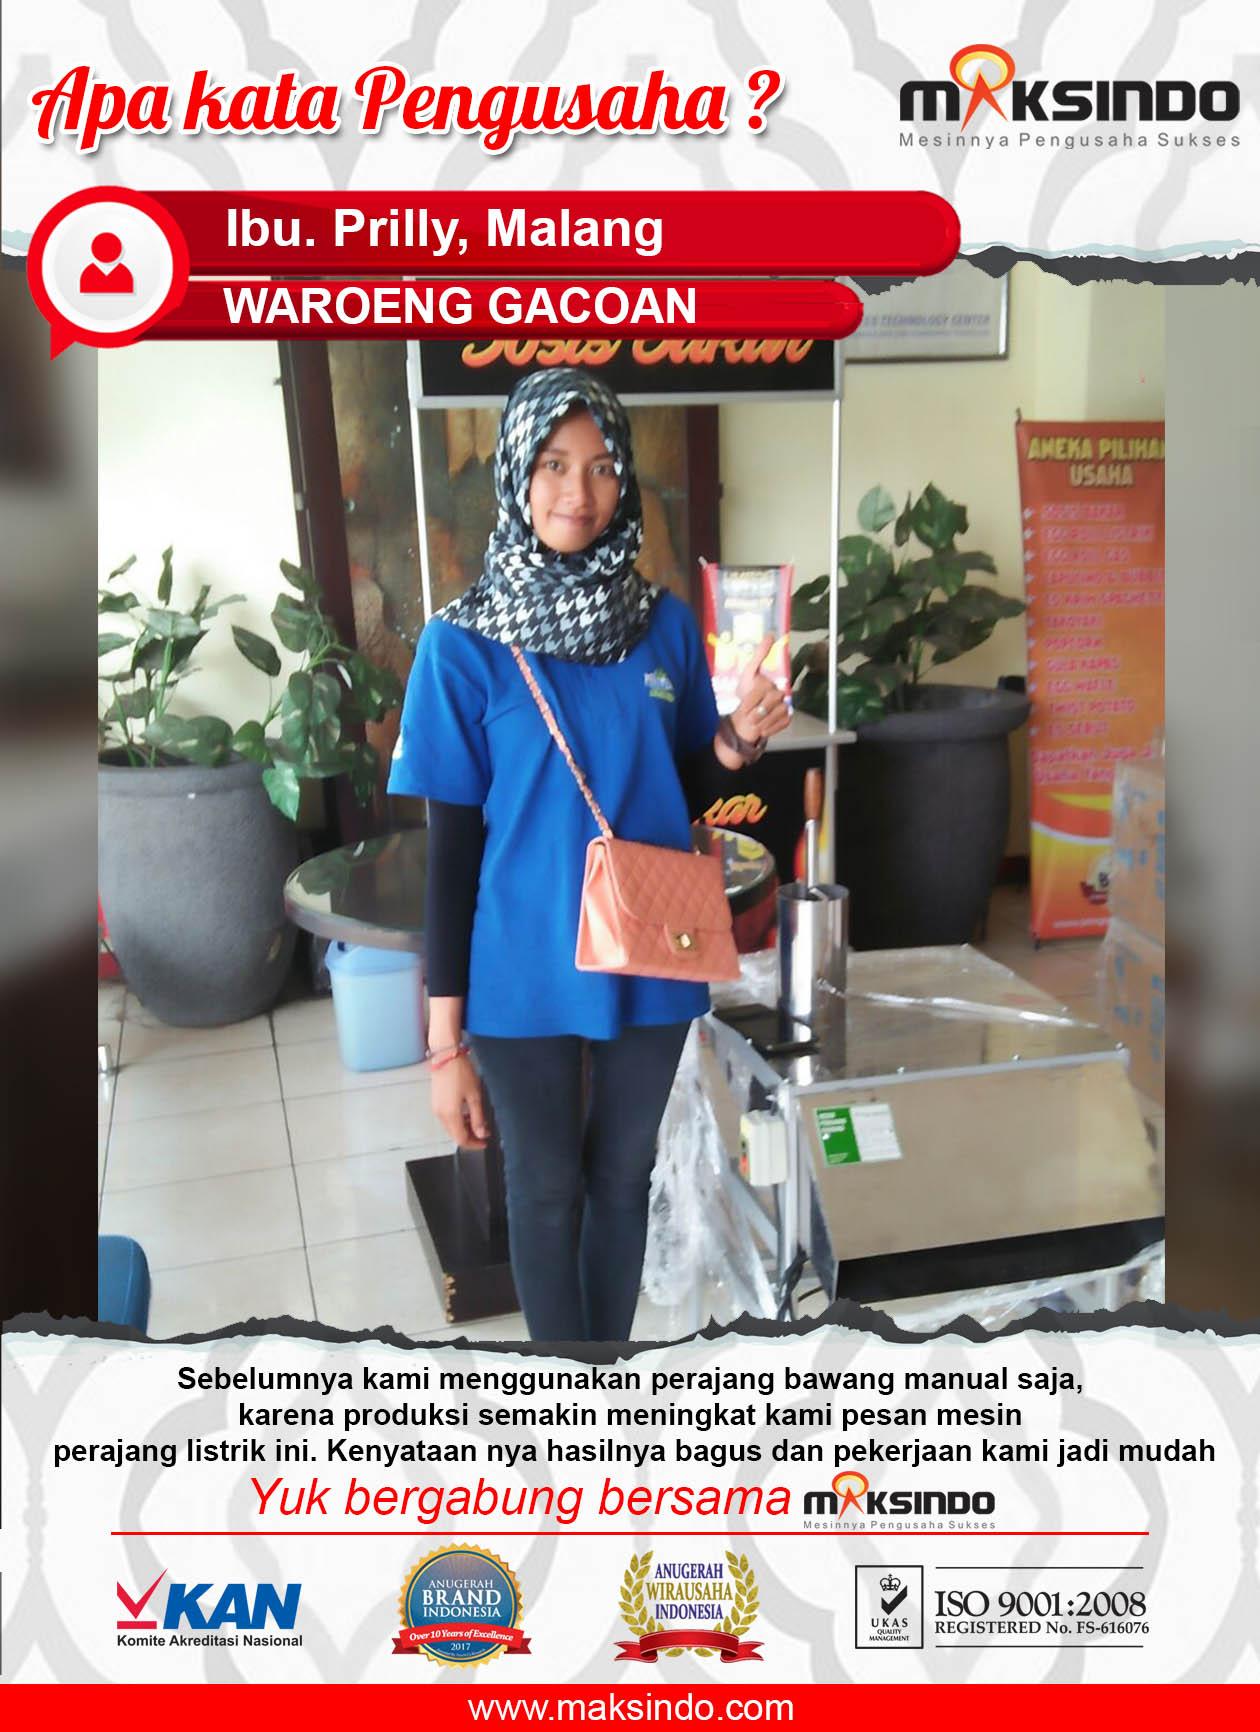 Waroeng Gacoan : Mesin Perajang Bawang Maksindo Mempermudah Pekerjaan